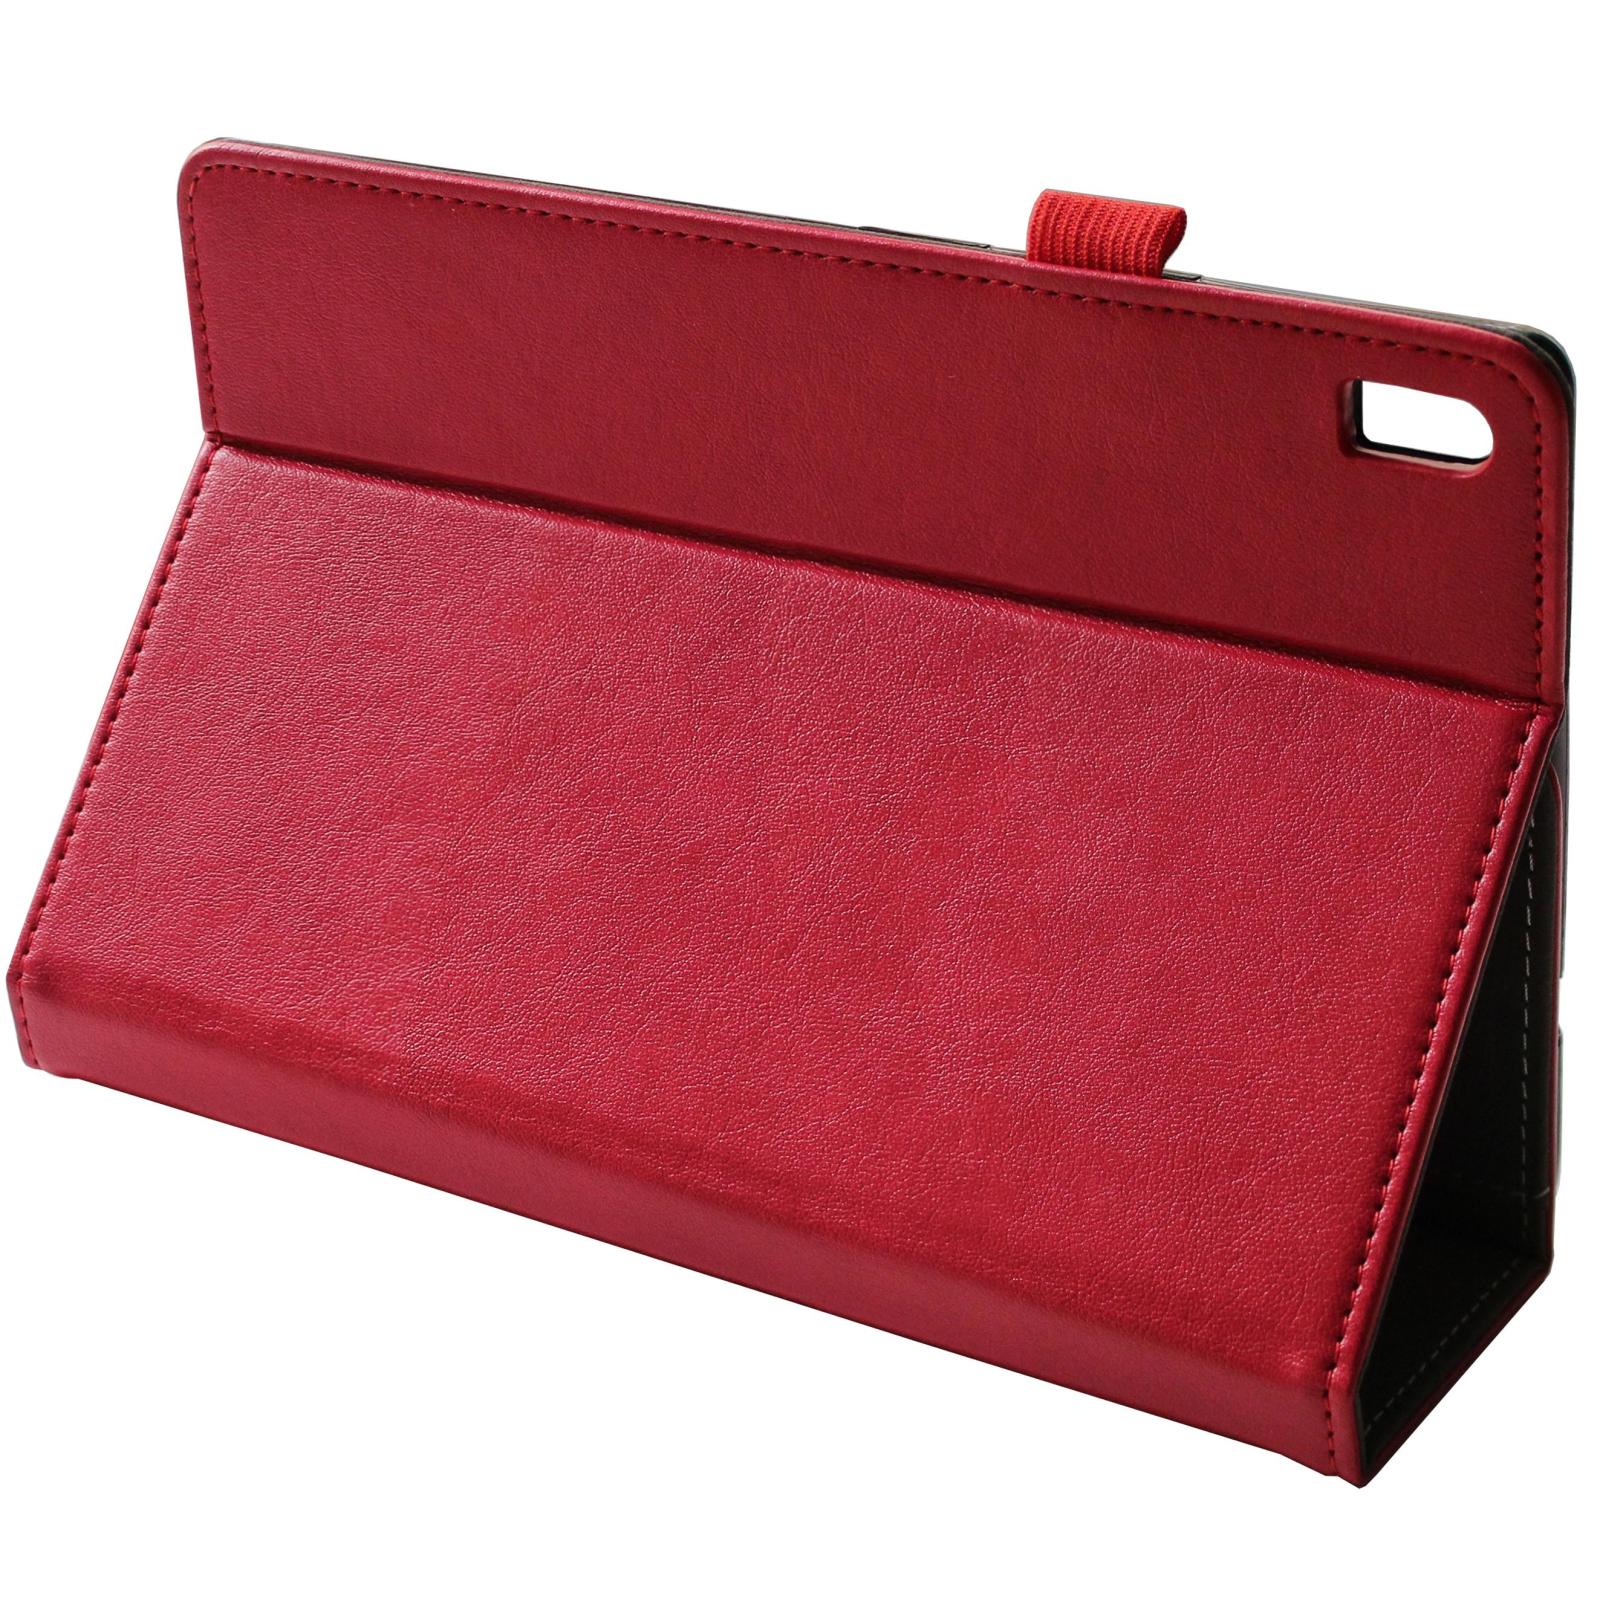 Чехол для планшета Grand-X для Lenovo TAB4 8 Plus TB-8704 Business Class Red (LTC-LT48PBR) изображение 6